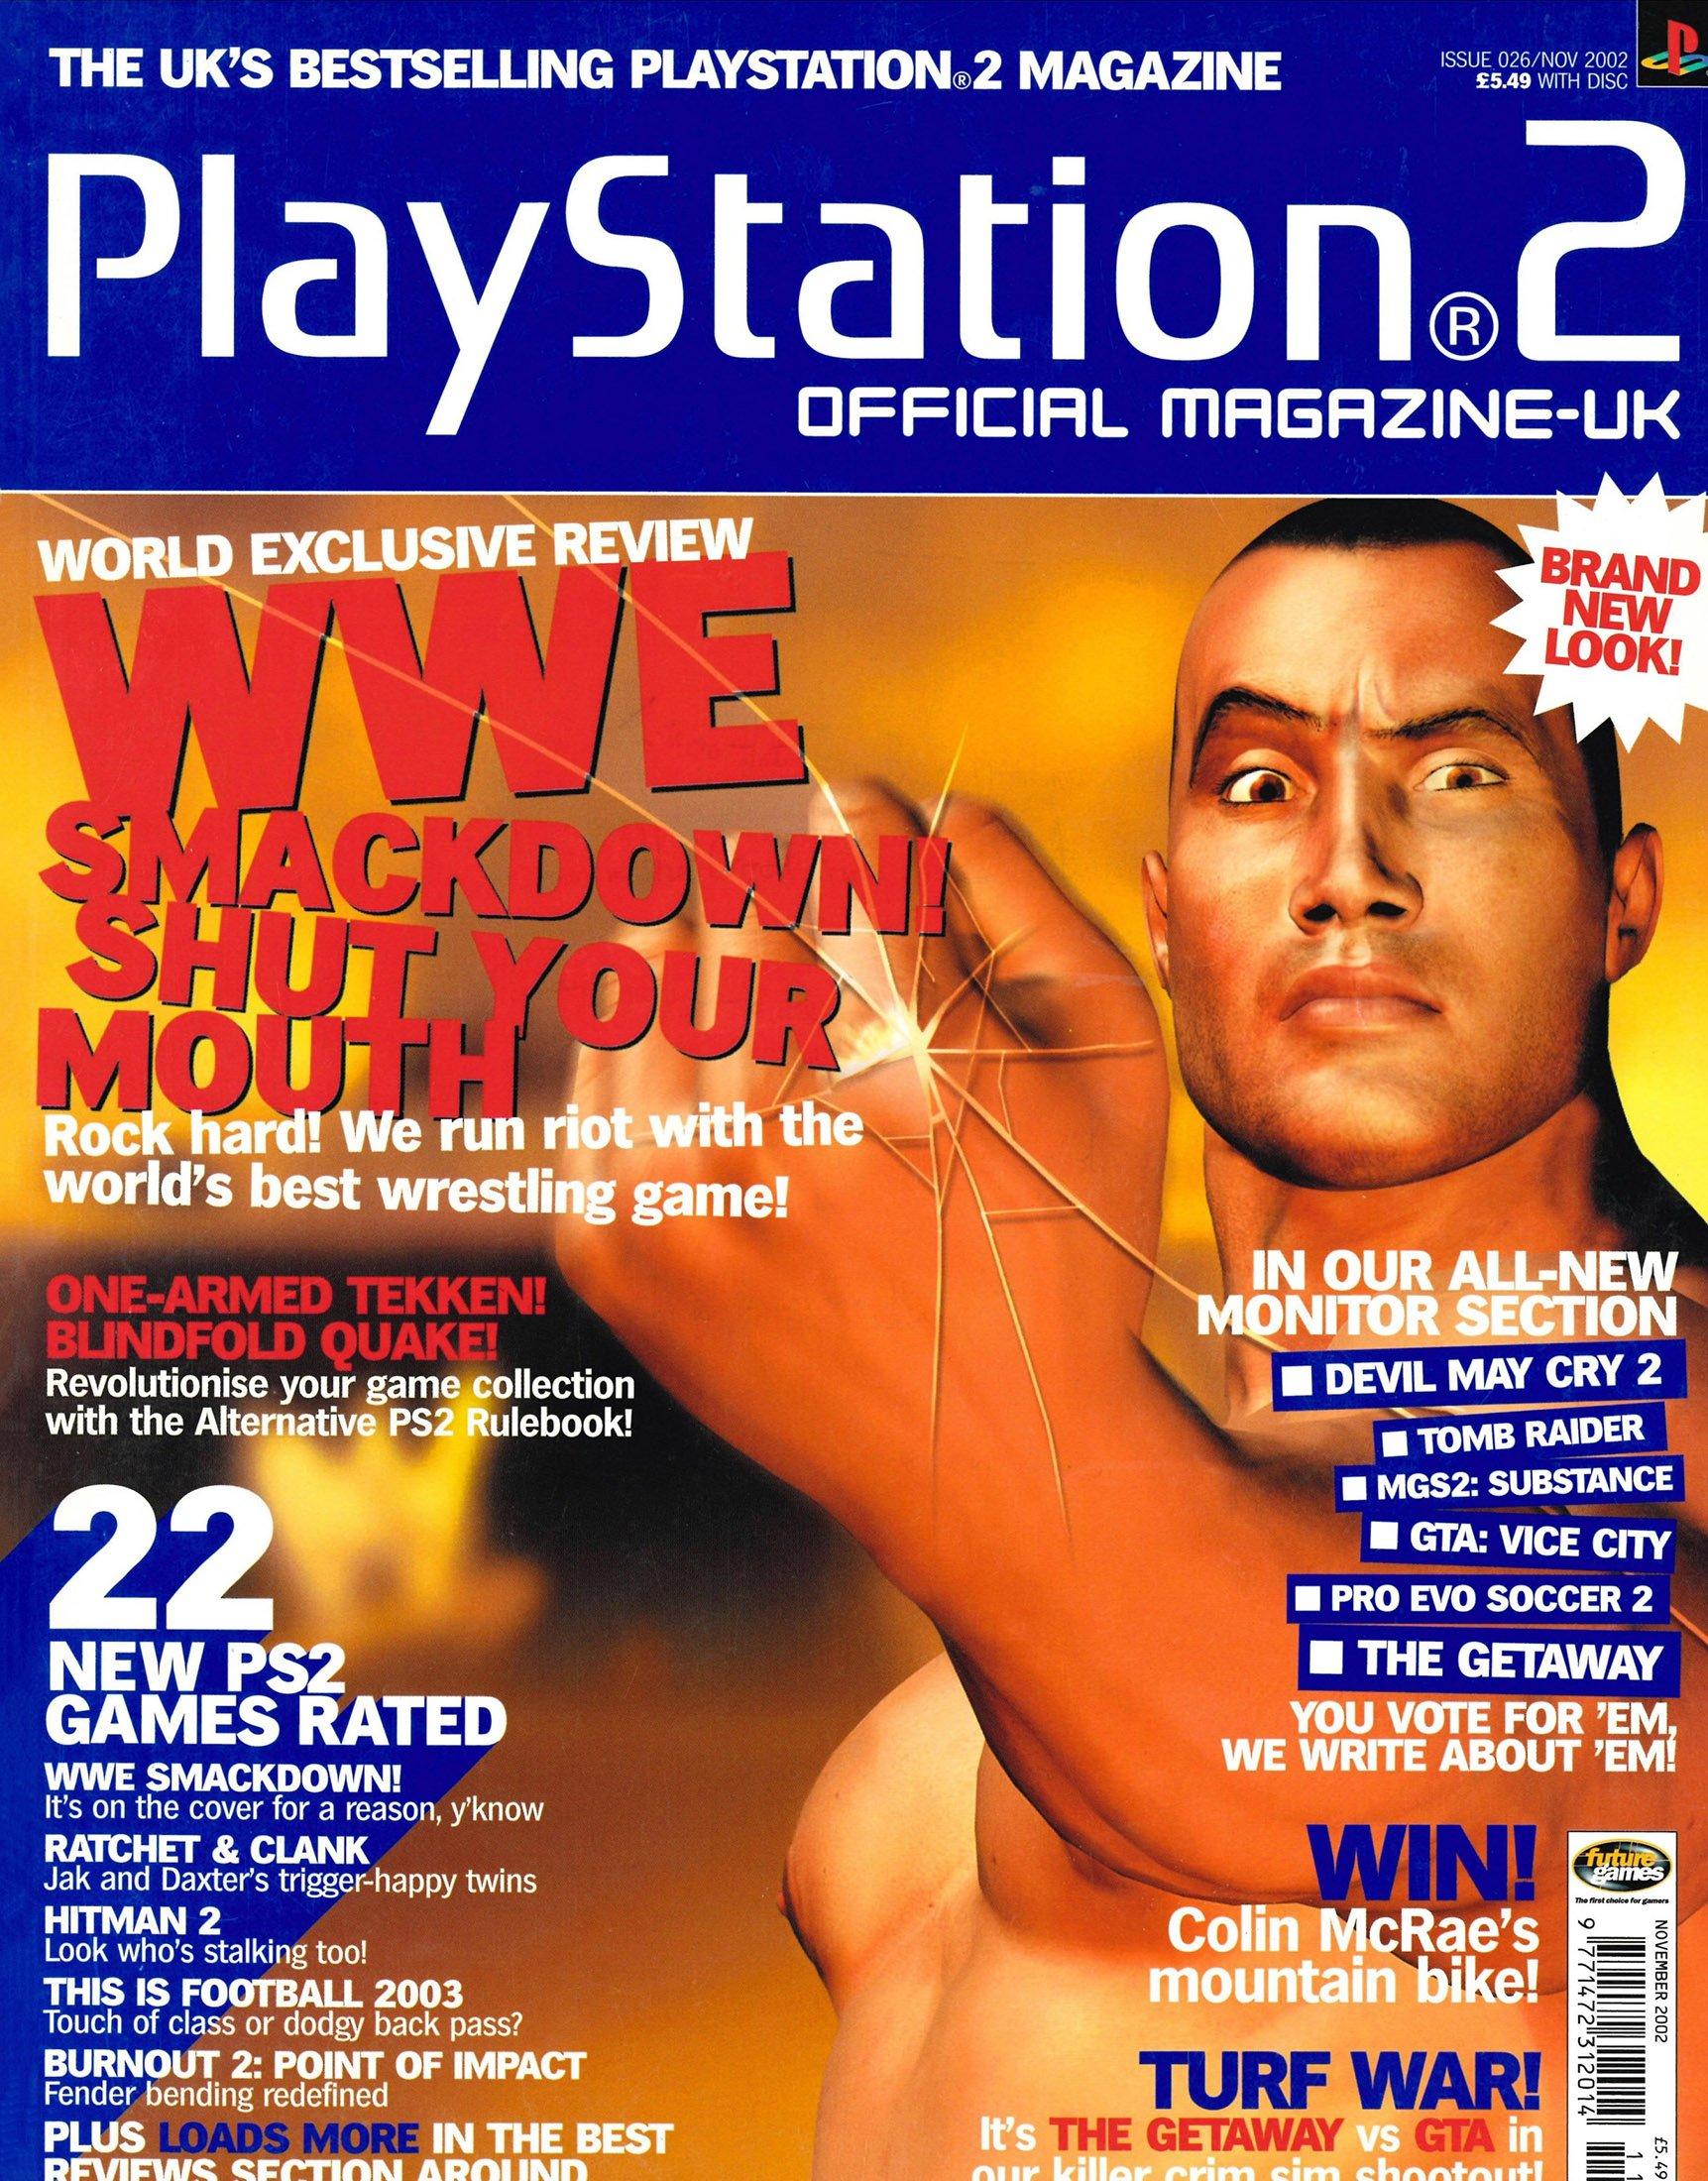 Official Playstation 2 Magazine UK 026 (November 2002)